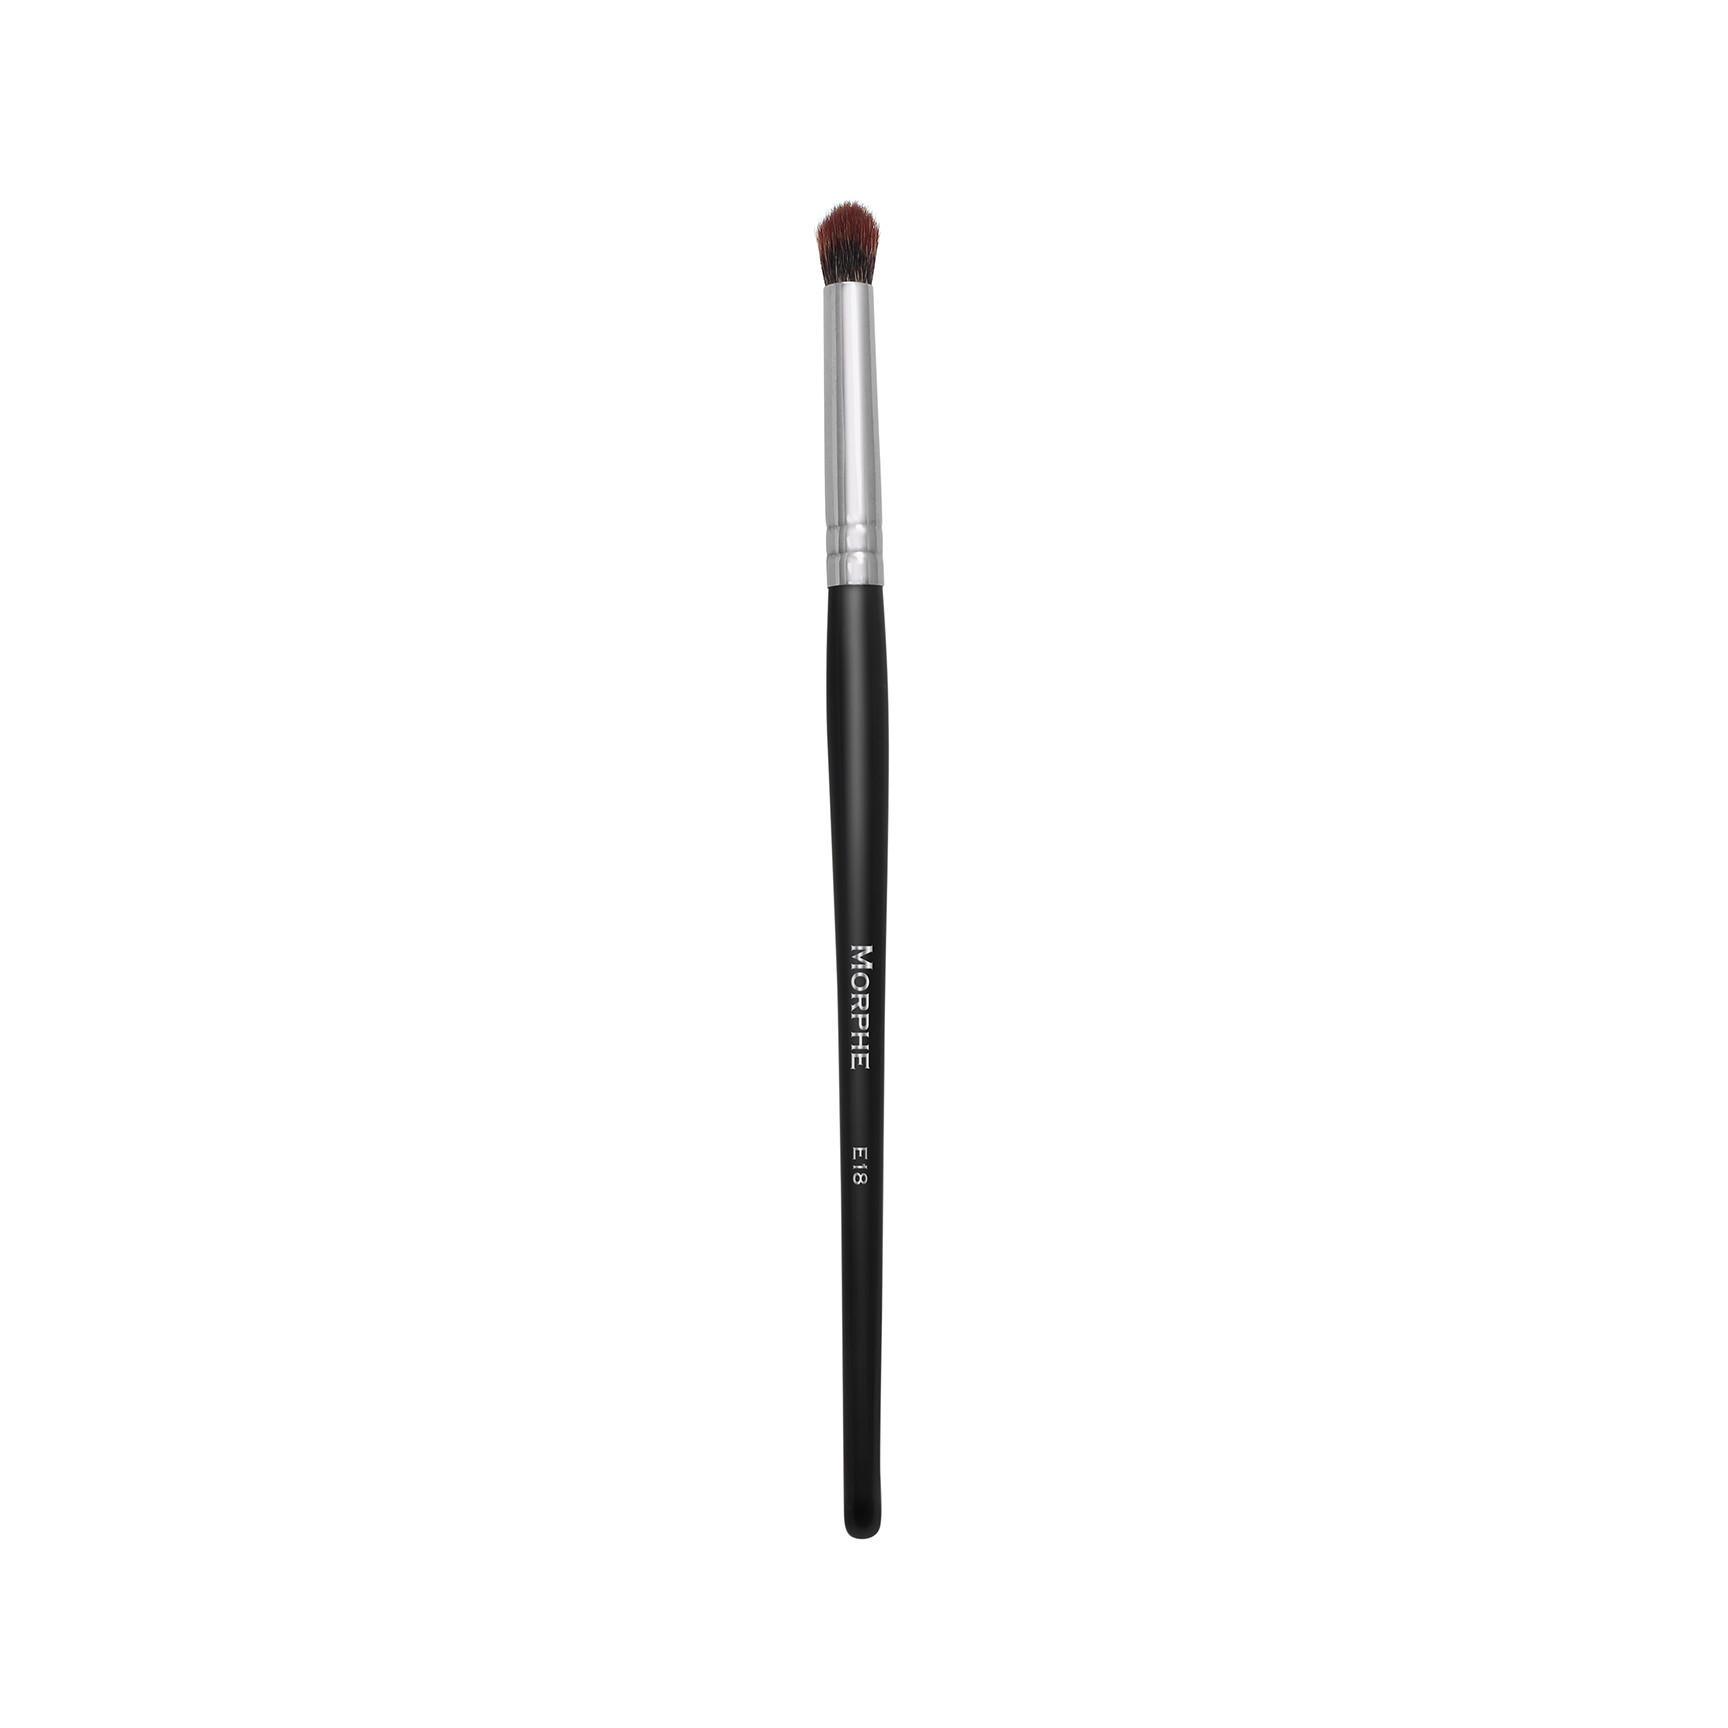 Morphe Round Crease Brush E18